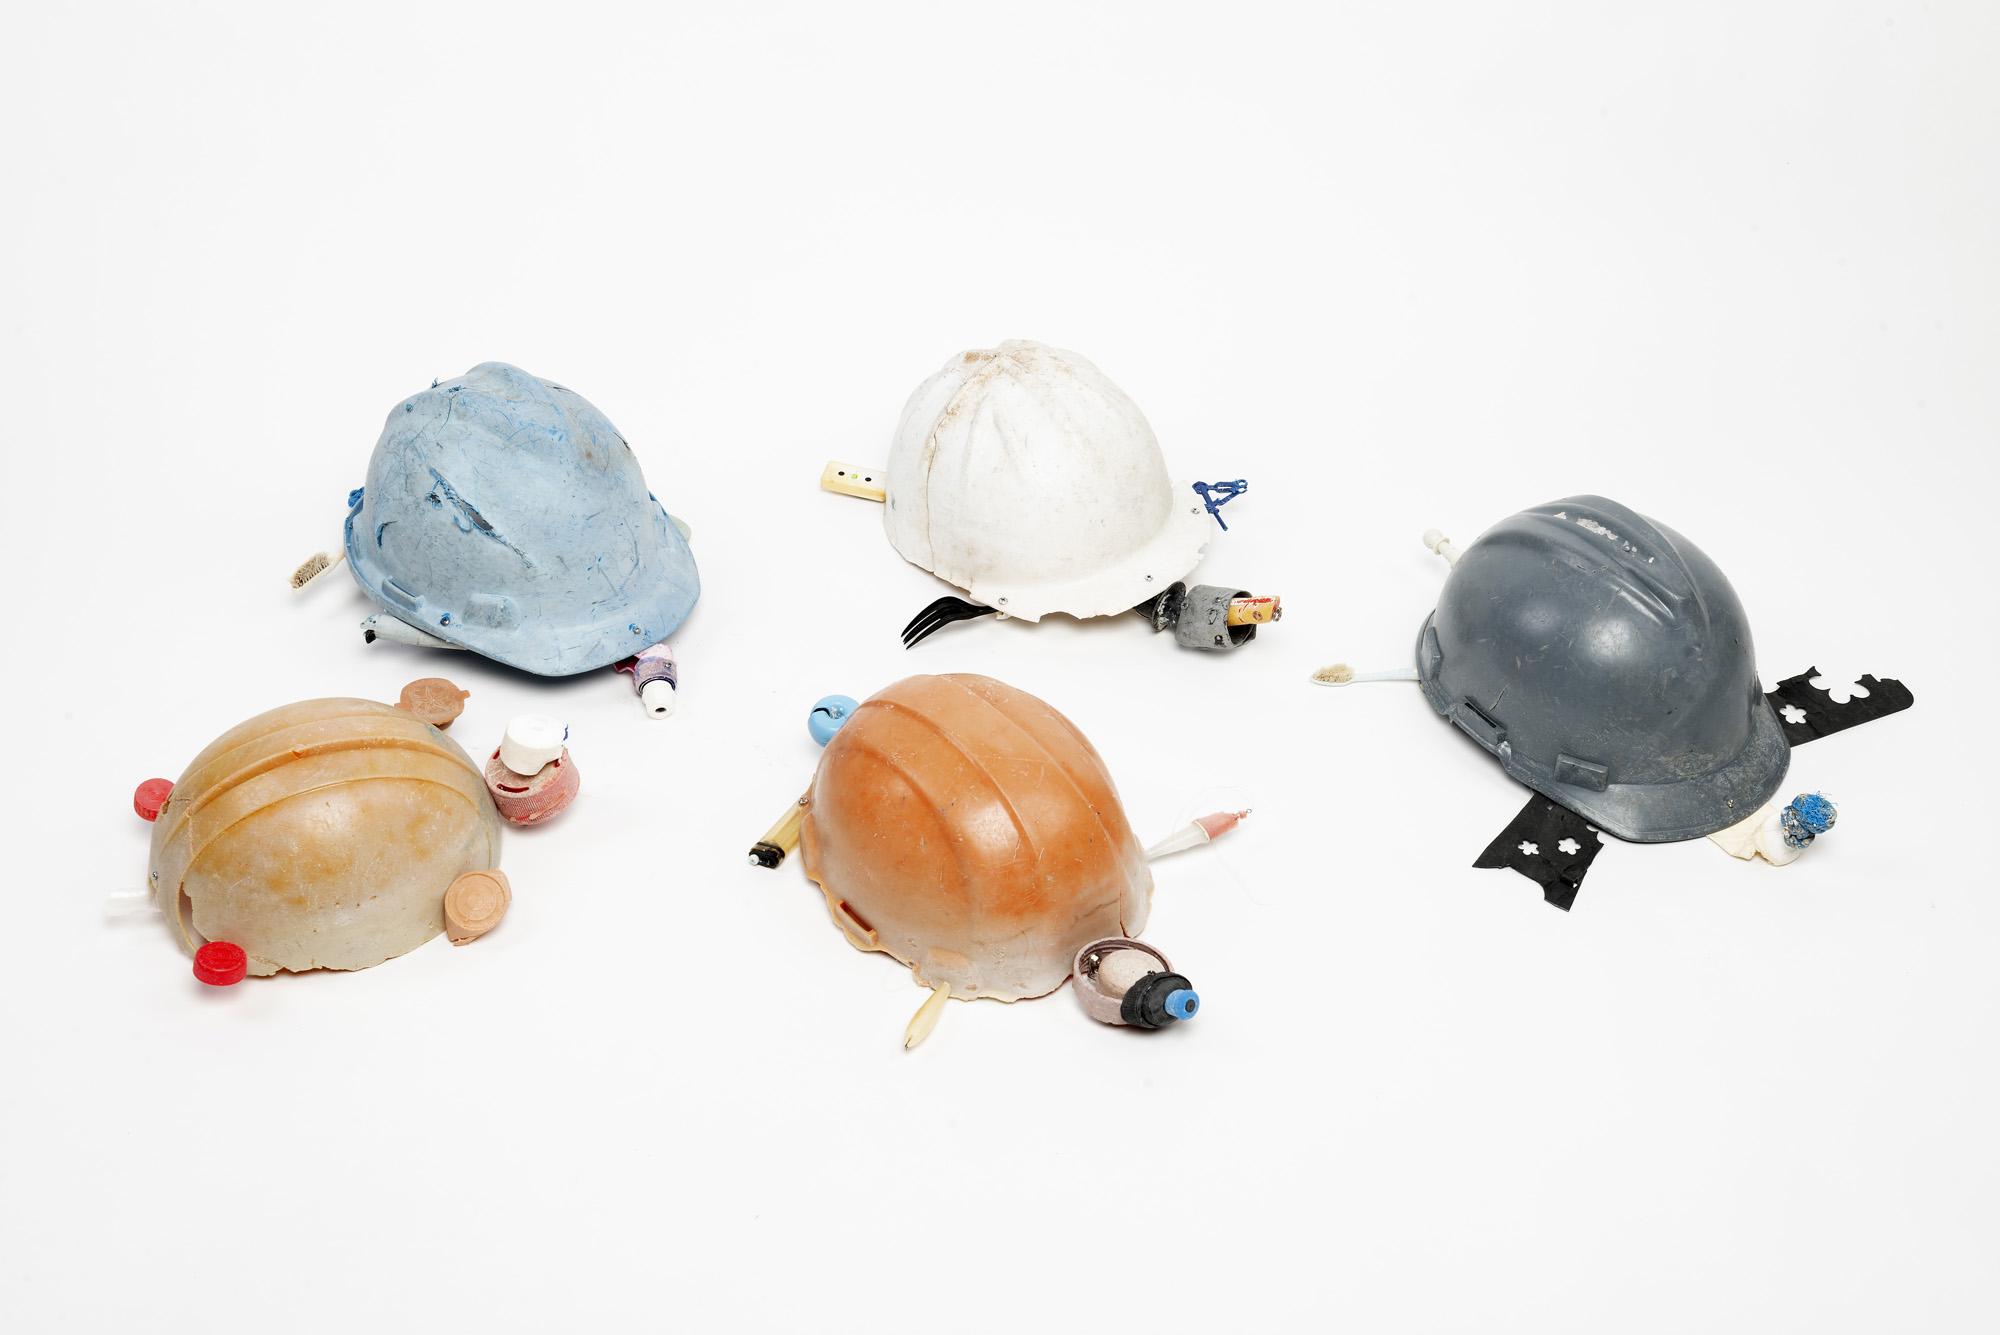 Plasticene Hatchlings 20 x 20 x 40 cm 2018